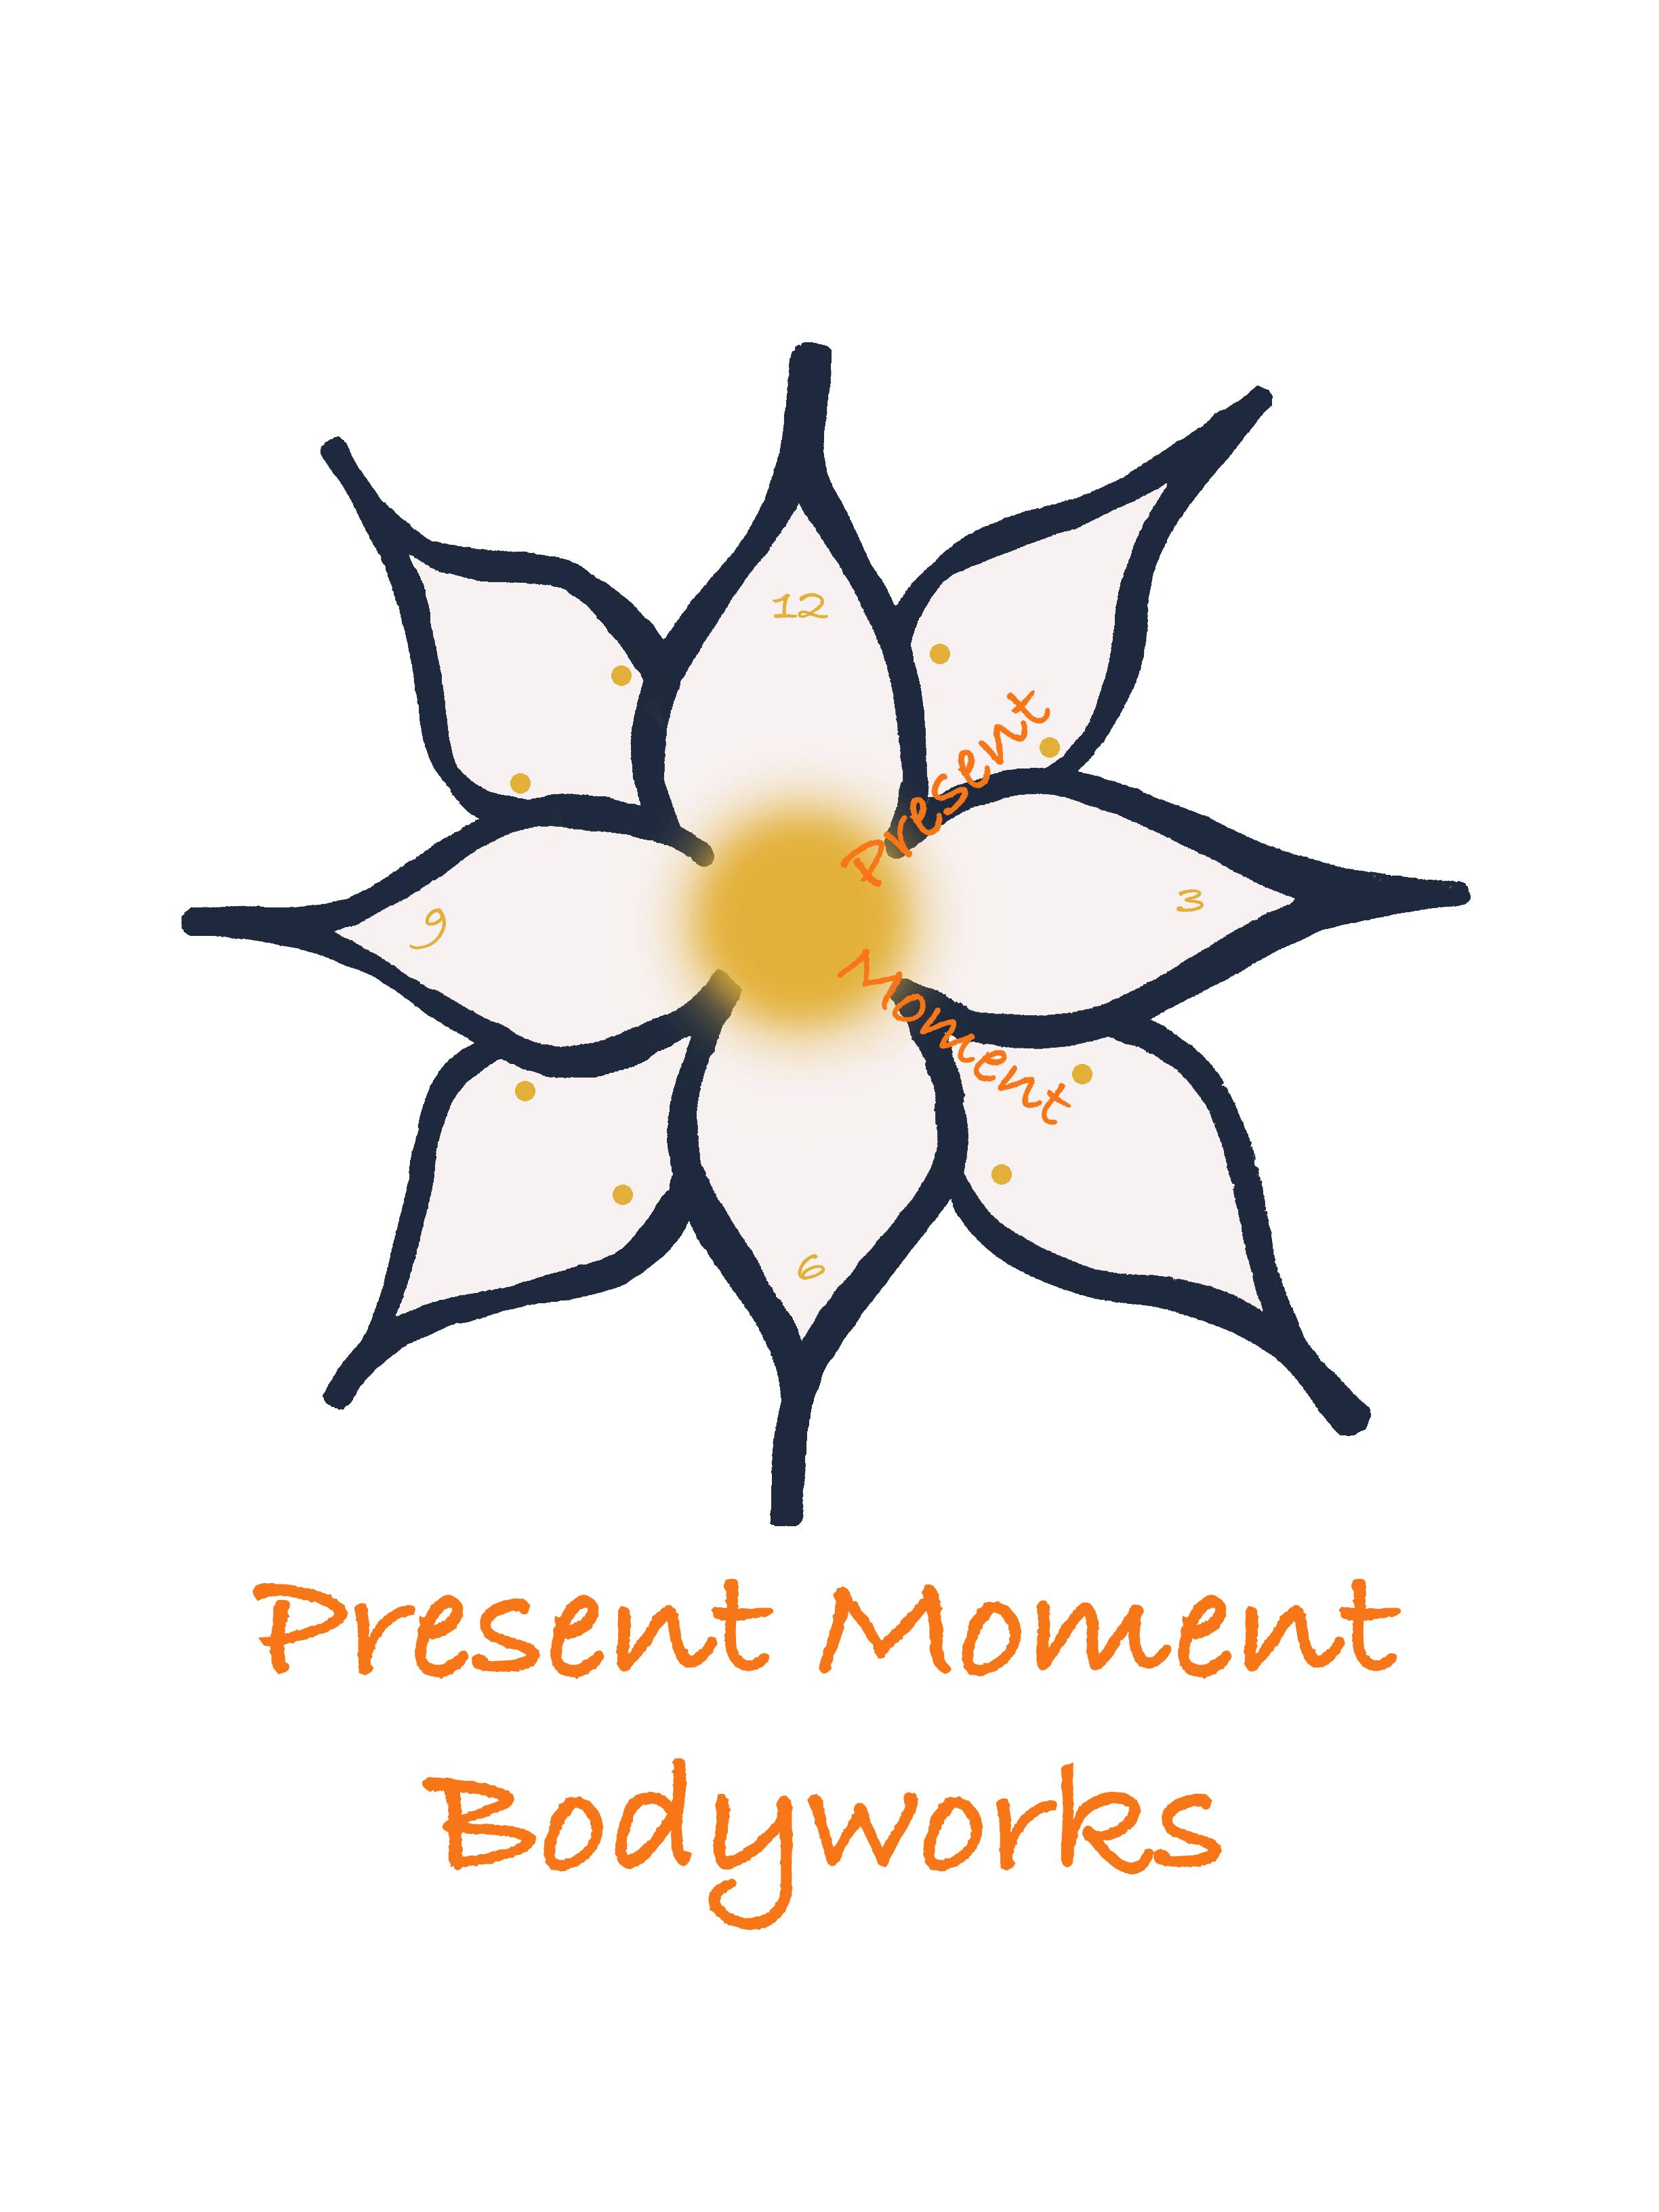 Present Moment Bodyworks